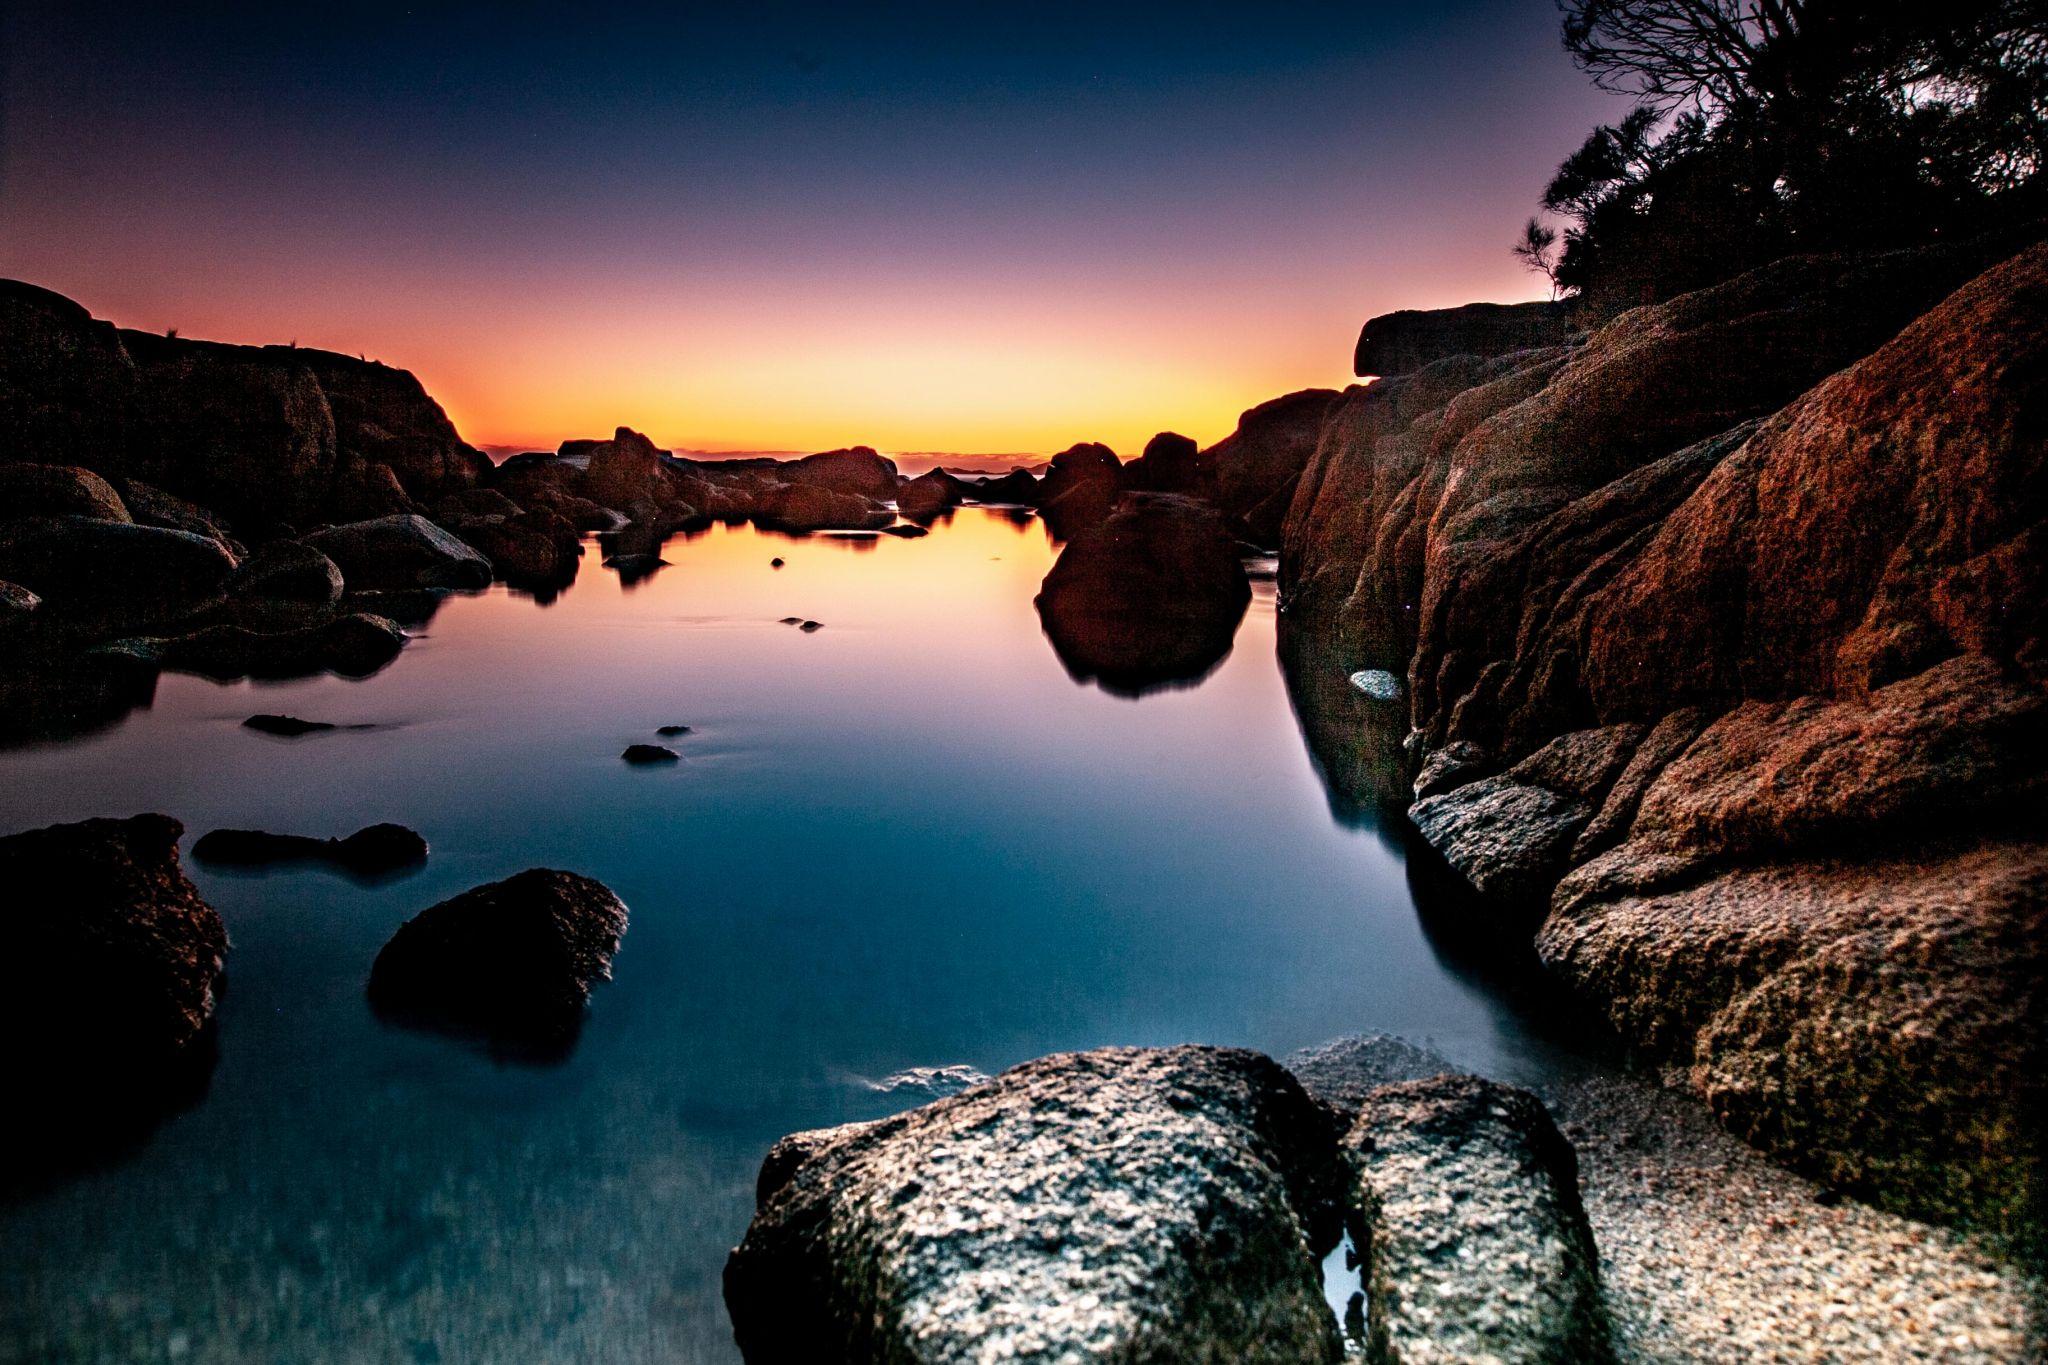 Binalong Bay sunrise Tasmania, Australia